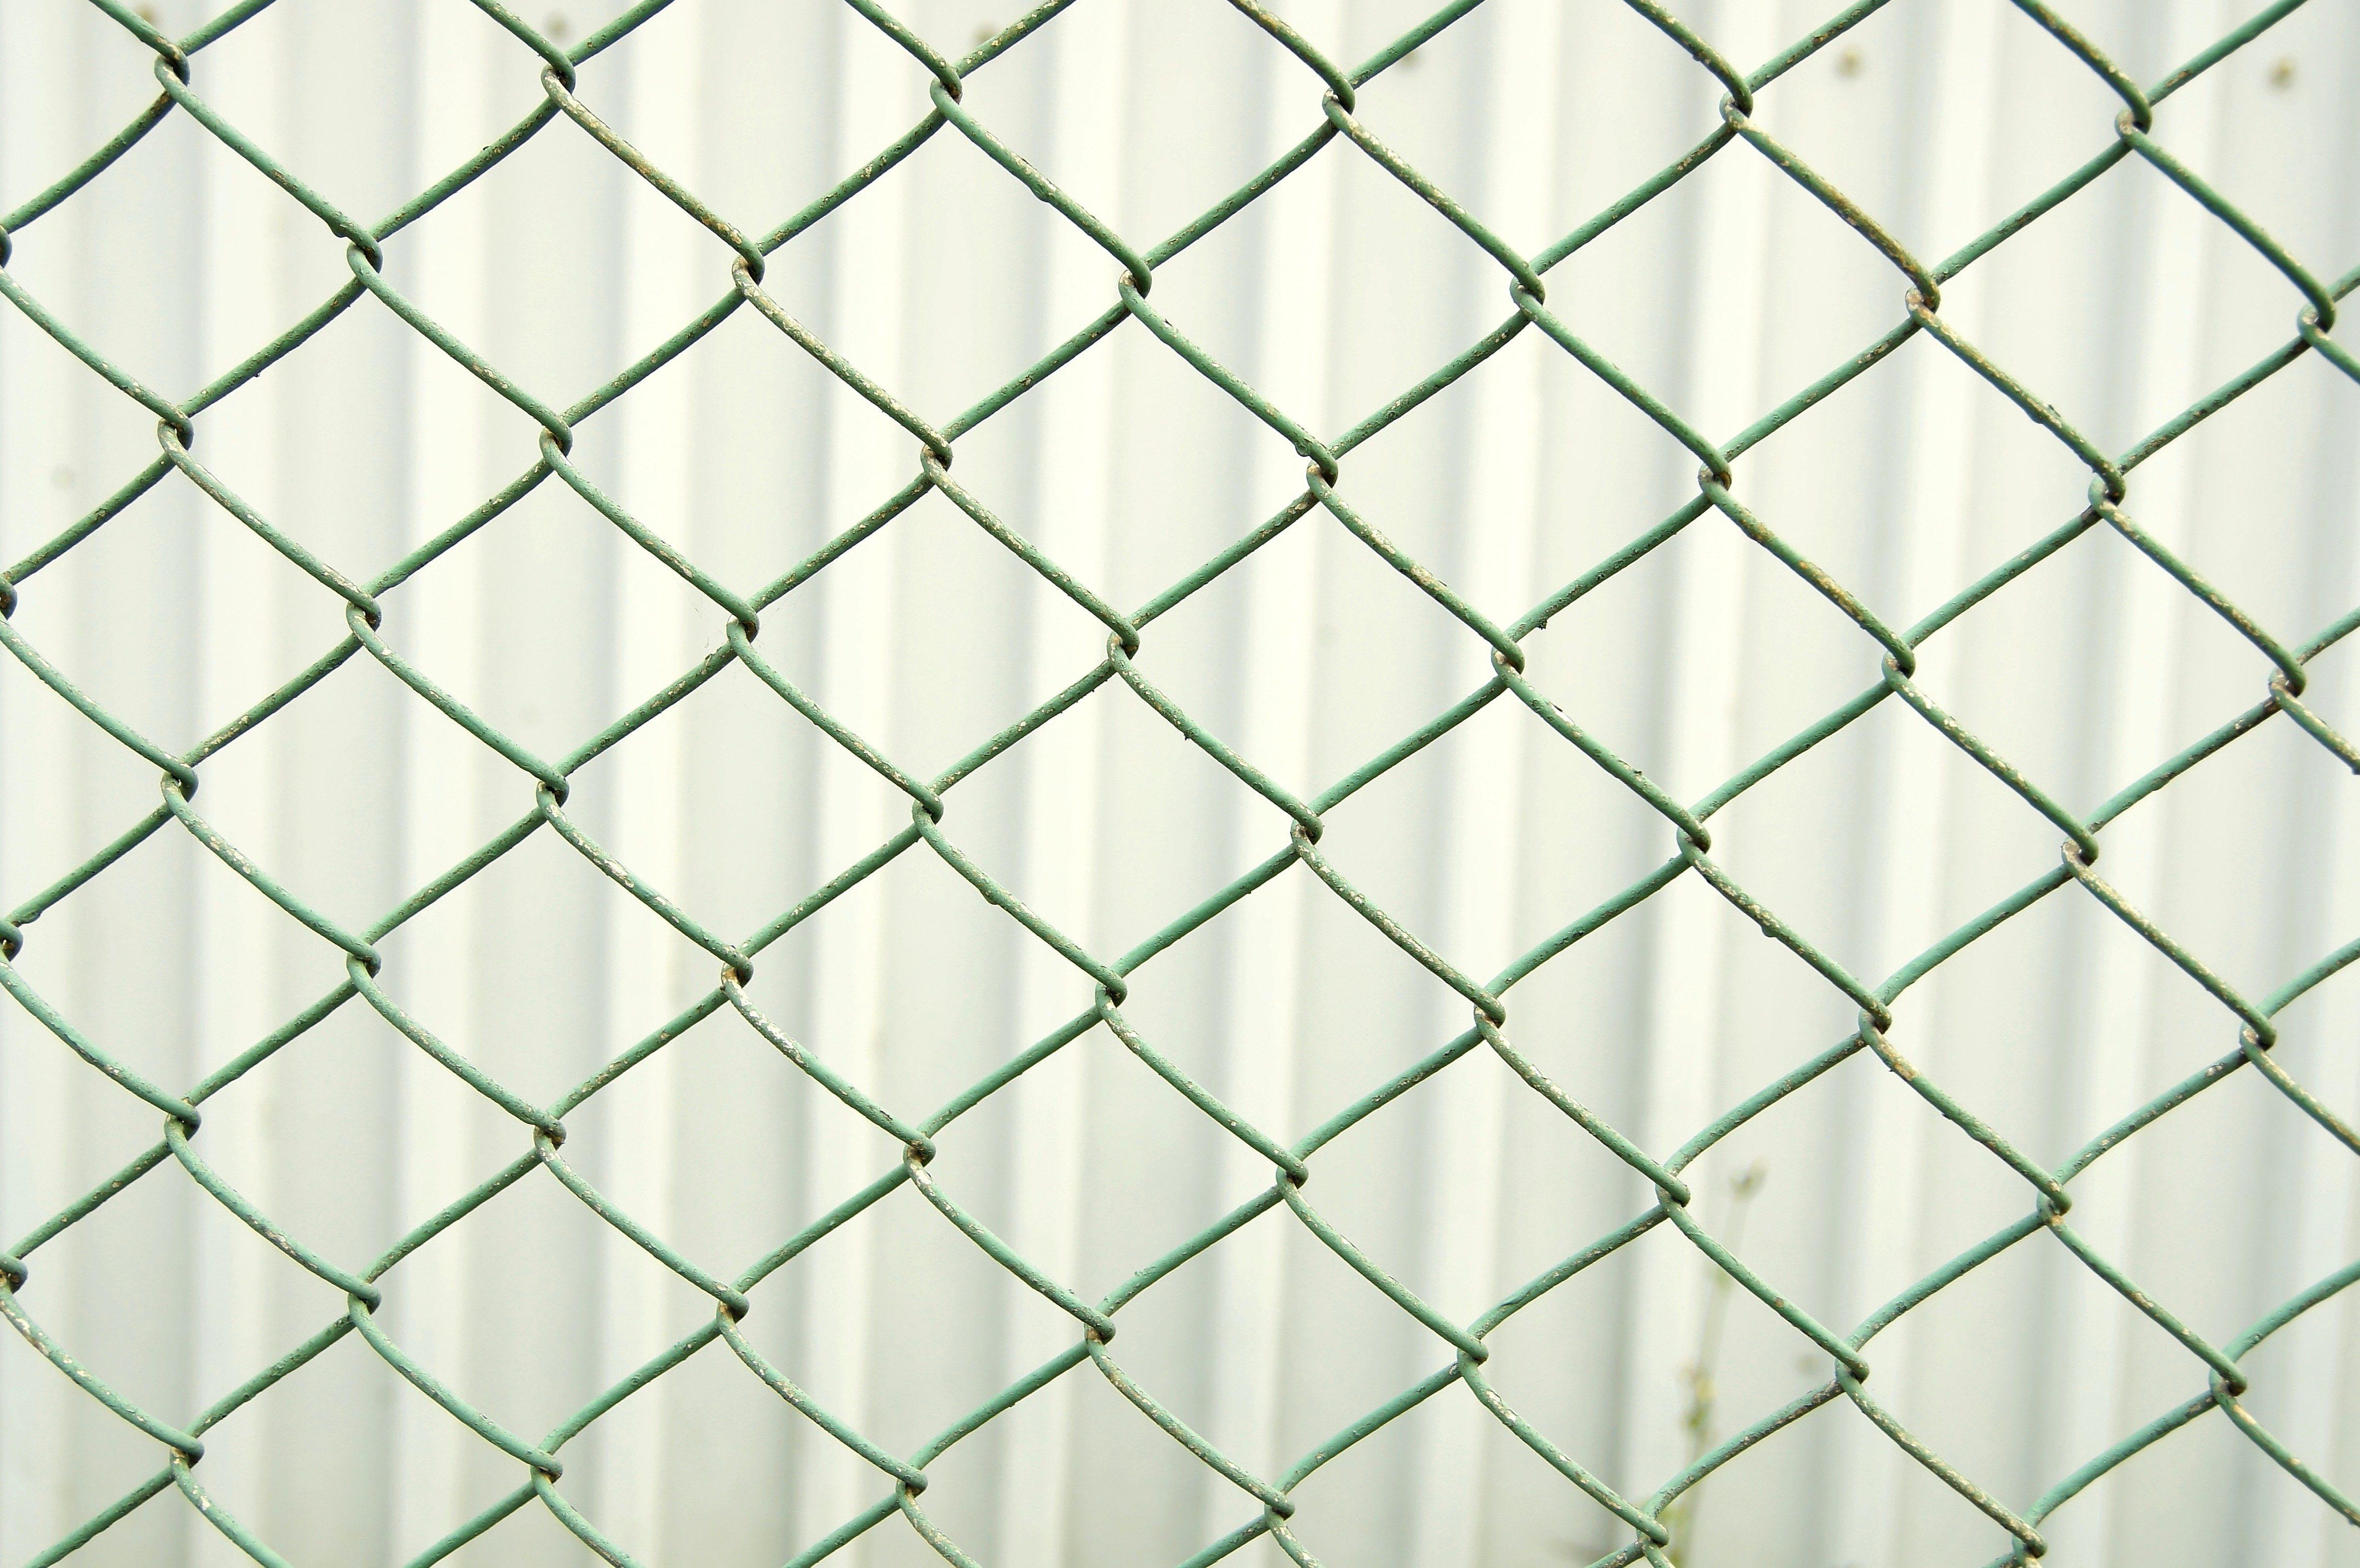 Imagen gratis valla de metal alambres acero textura